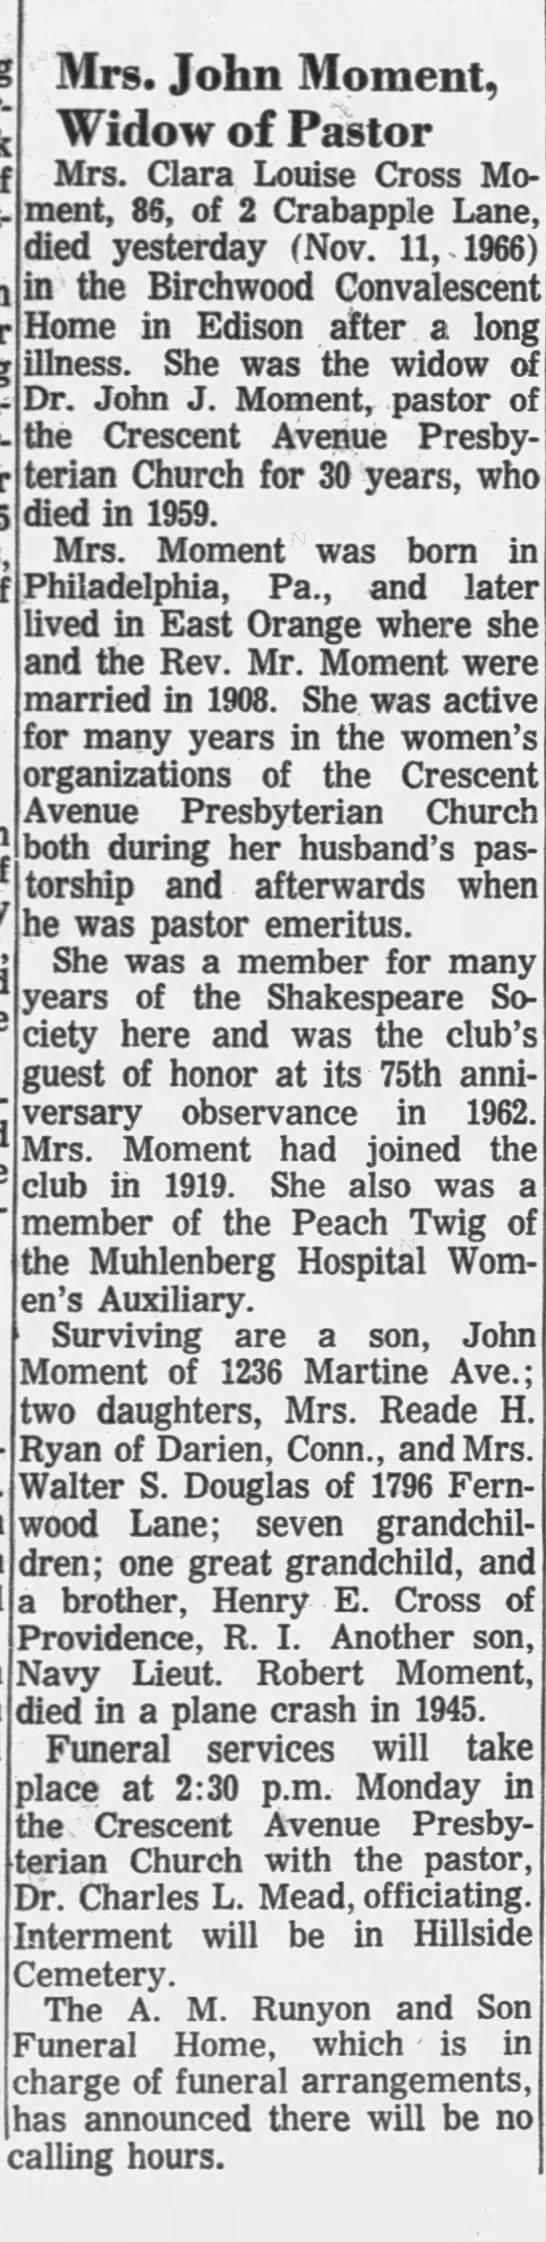 Obituary: Clara Louis Cross Moment (Aged 86) -